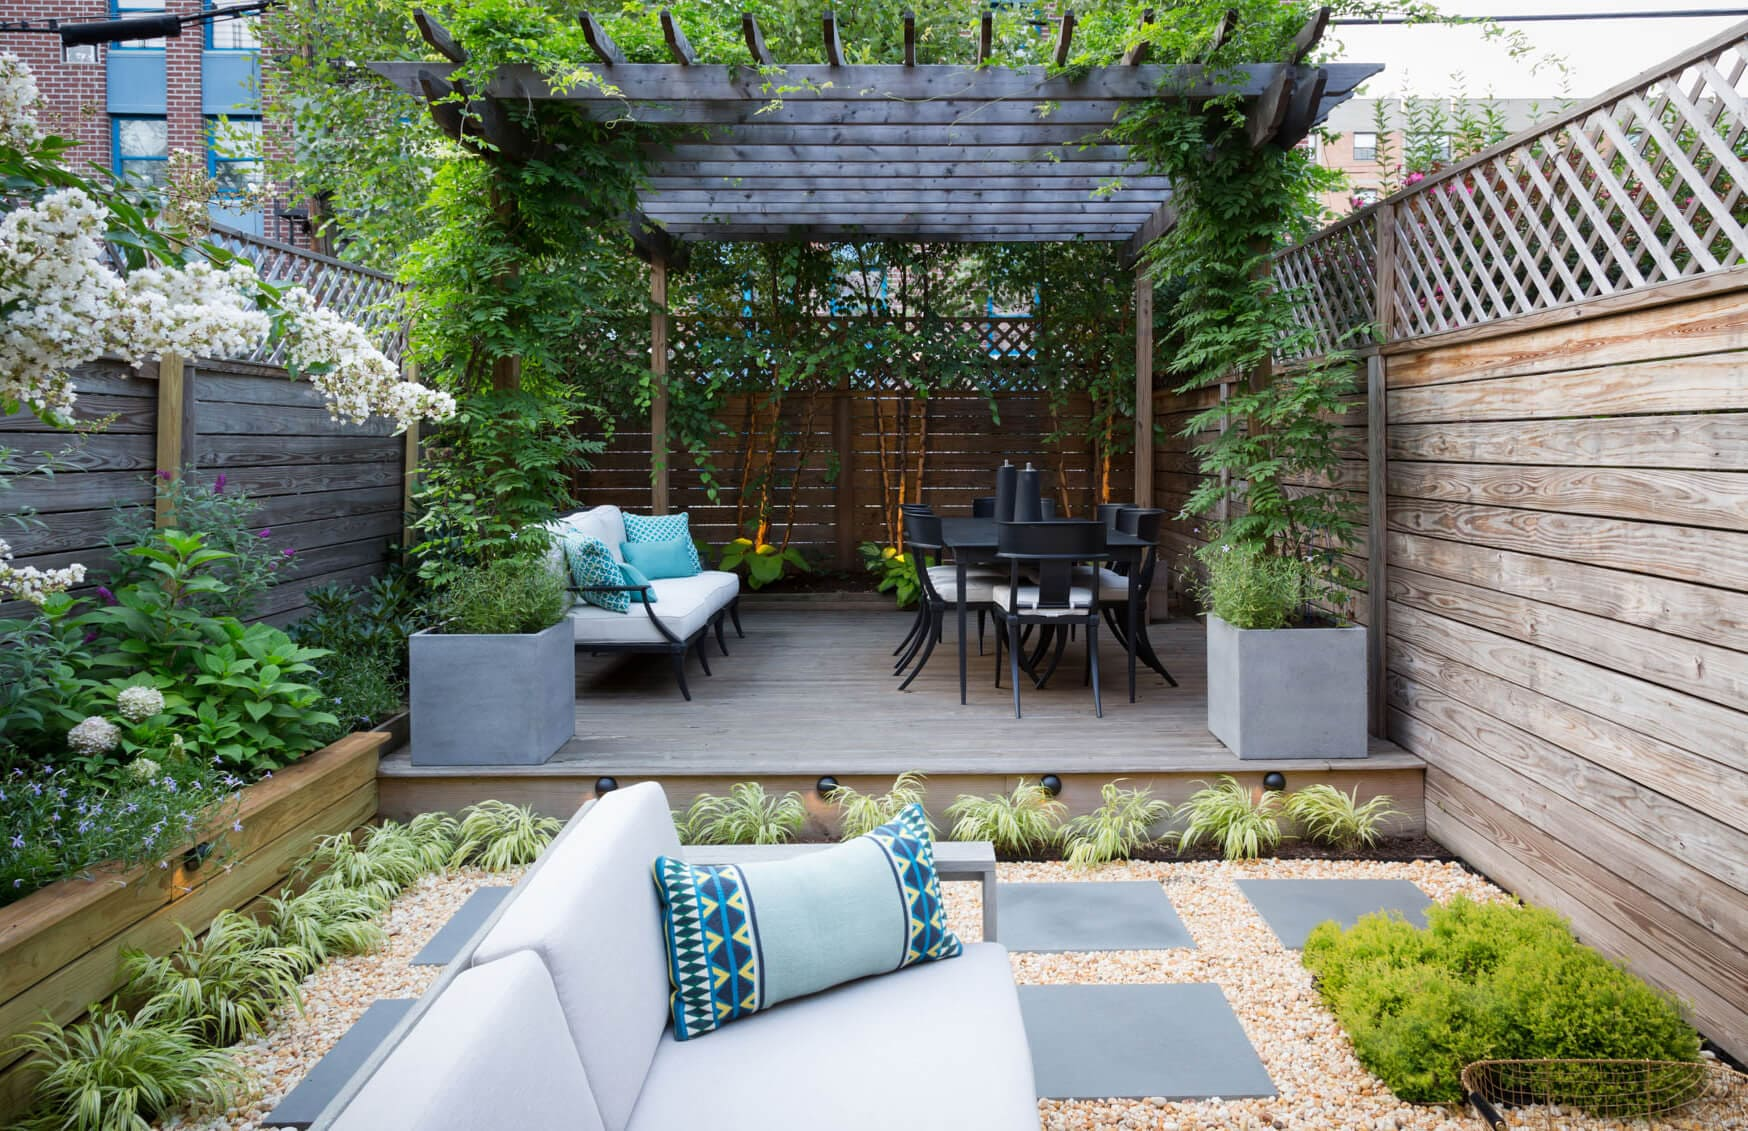 4.Unused Driveway into a Cozy Backyard by Simphome.com 2